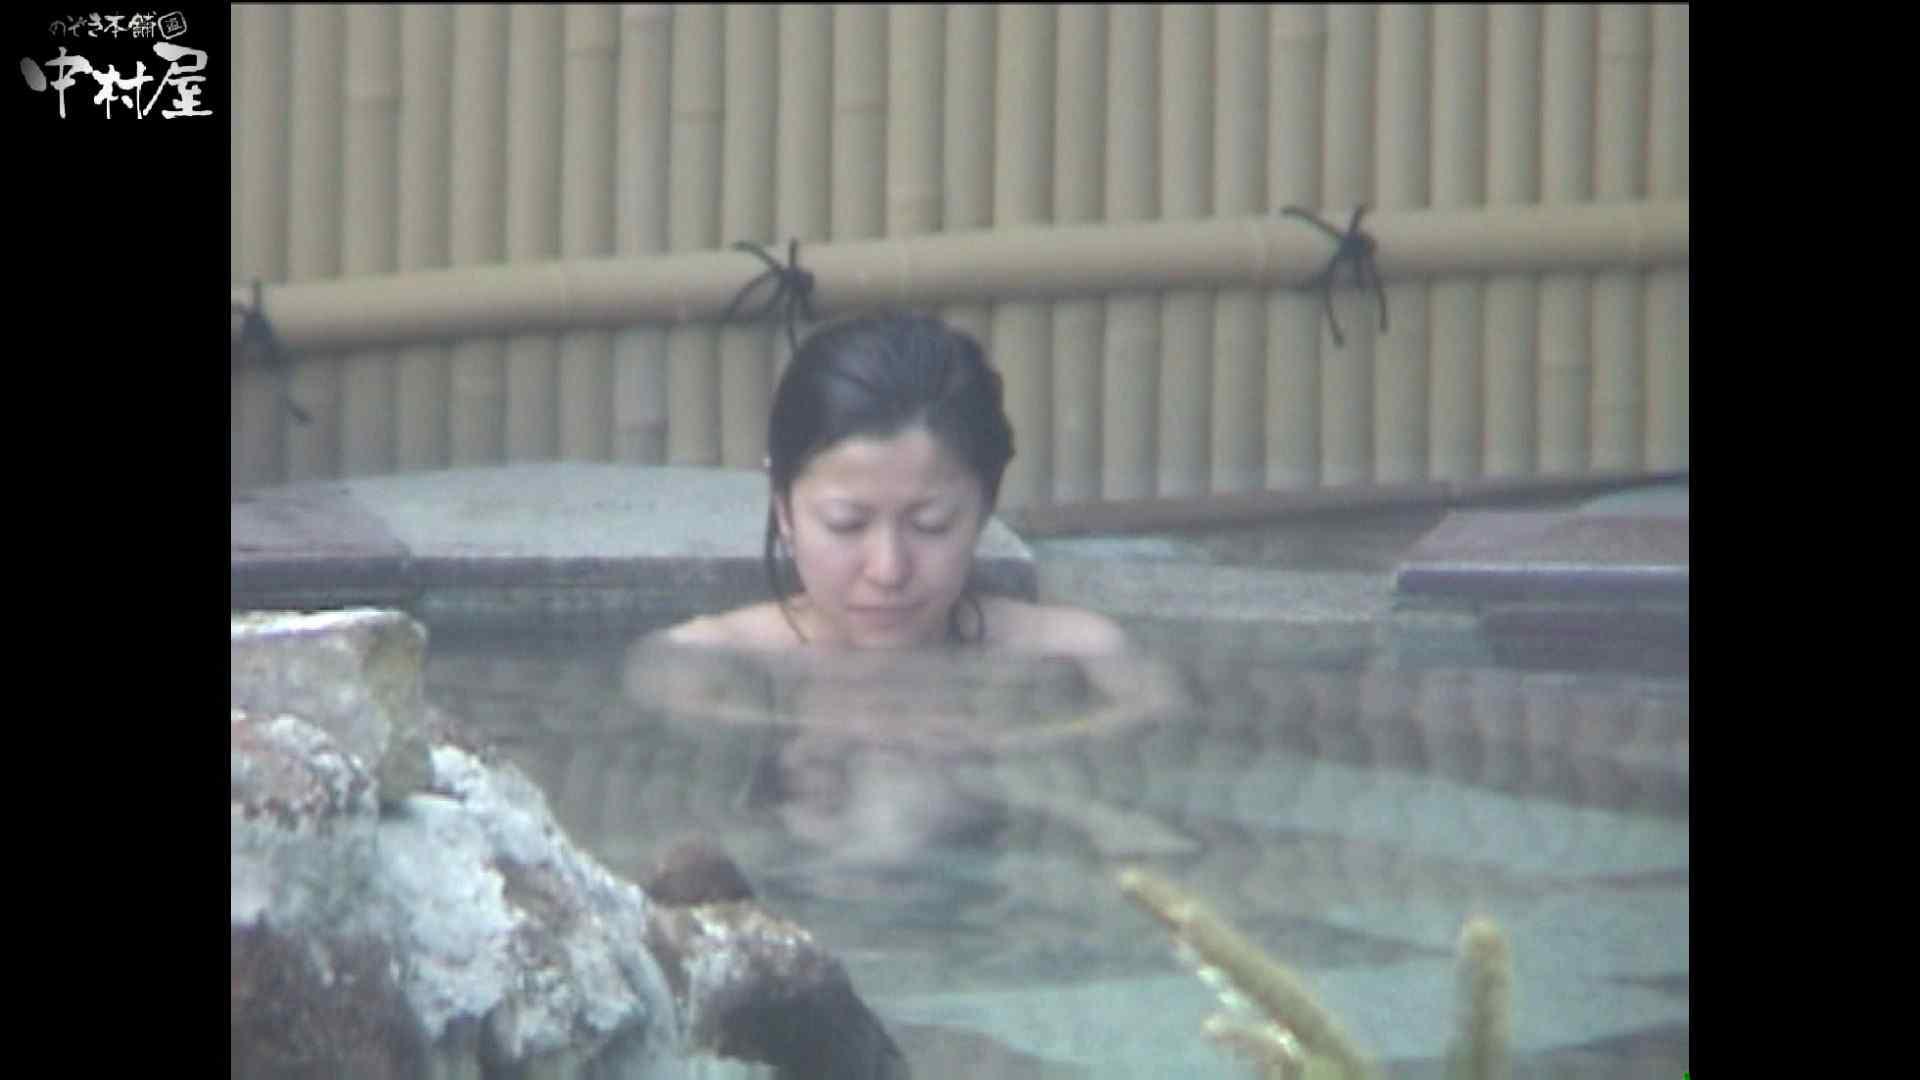 Aquaな露天風呂Vol.986 盗撮特撮 ワレメ動画紹介 13pic 11